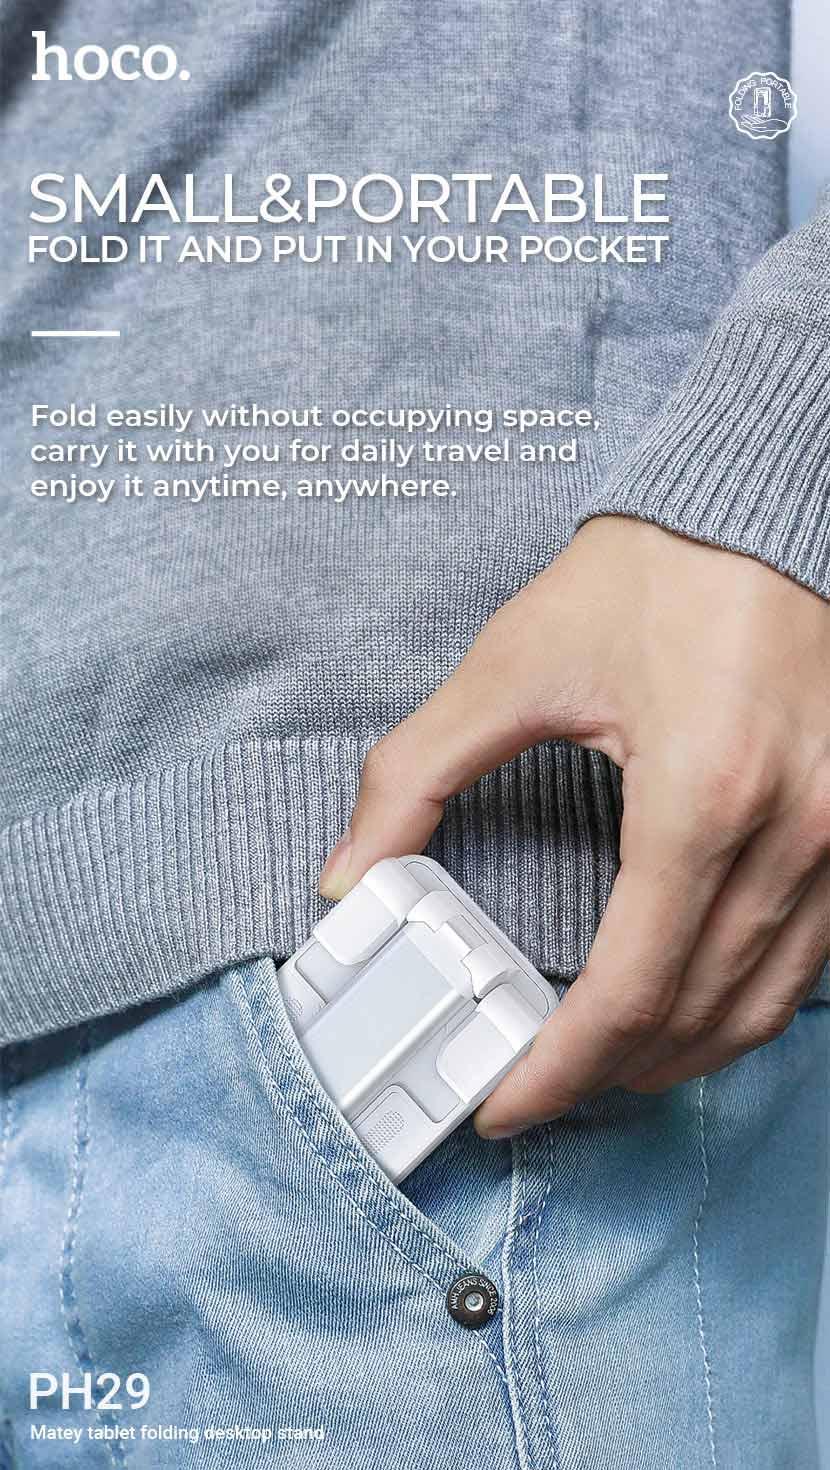 hoco news ph29 matey tablet folding desktop stand portable en